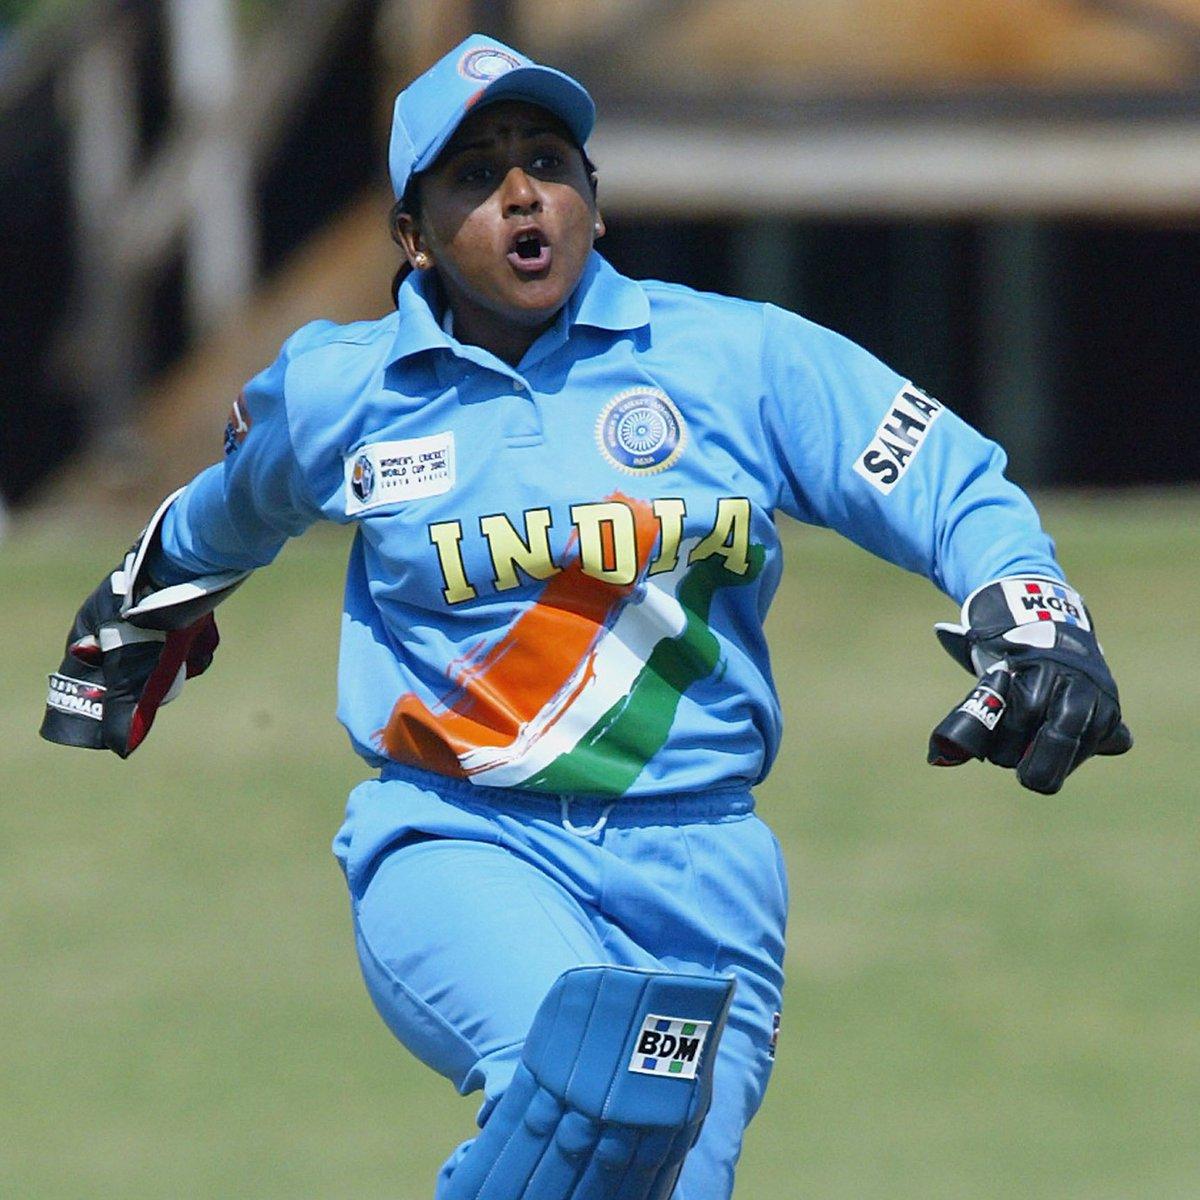 Anju Jain, Baroda women cricket team, women cricket, cricket, cricketers, players, head coach, coach, women cricket team, batsmen, bowlers, female players, sports players, game, match, Covid19, lockdown, BCA, ICC, mad over cricket